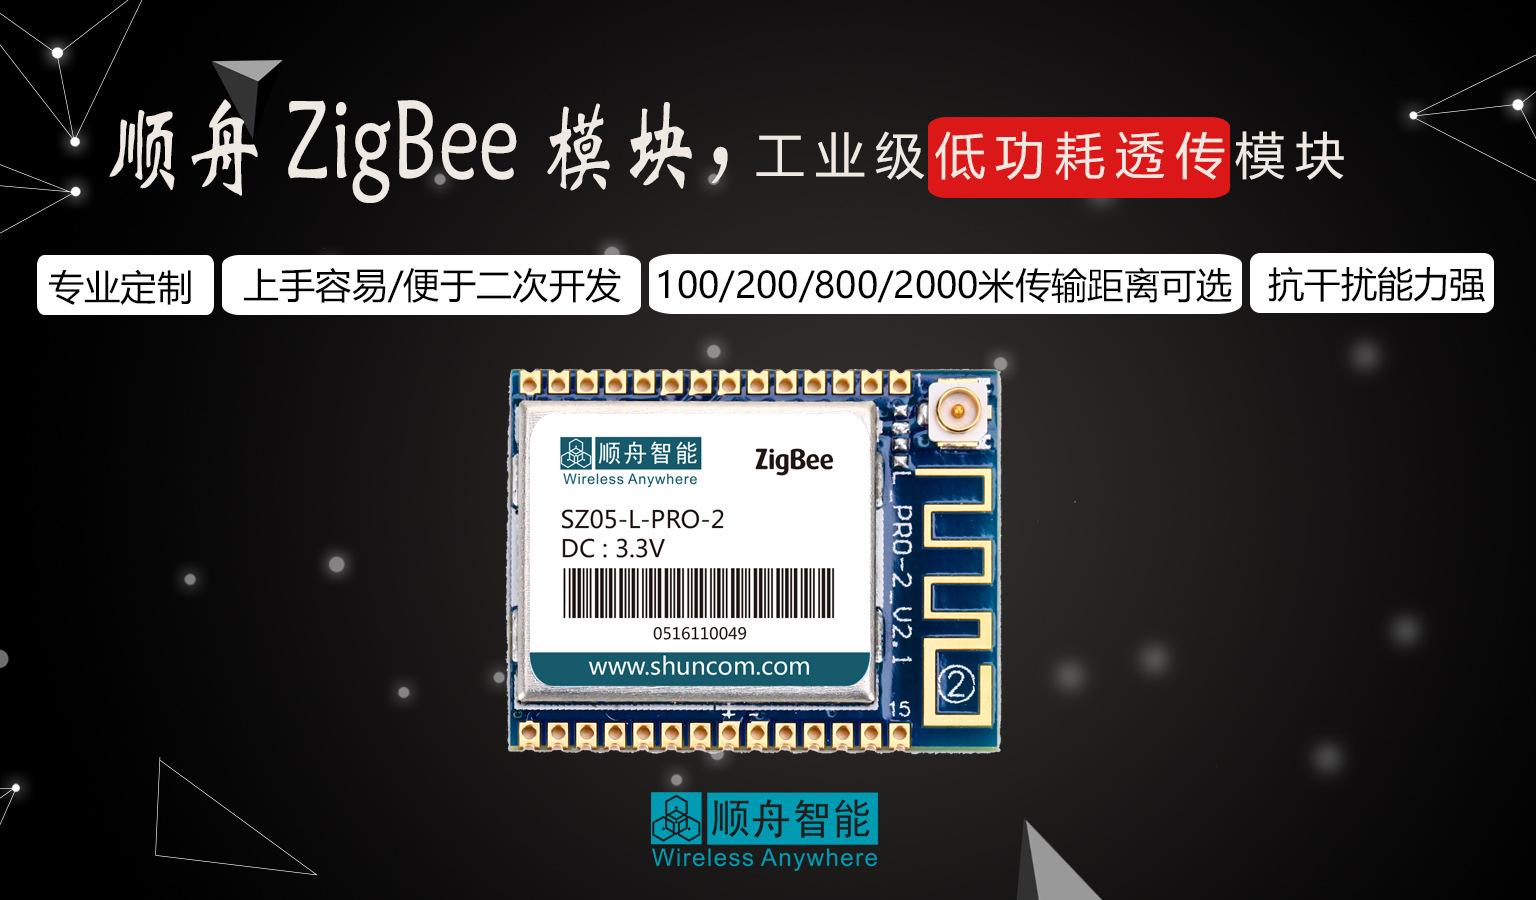 zigbee物联网传输模块厂家 无线传感数据采集zigbee模块 距离远示例图2